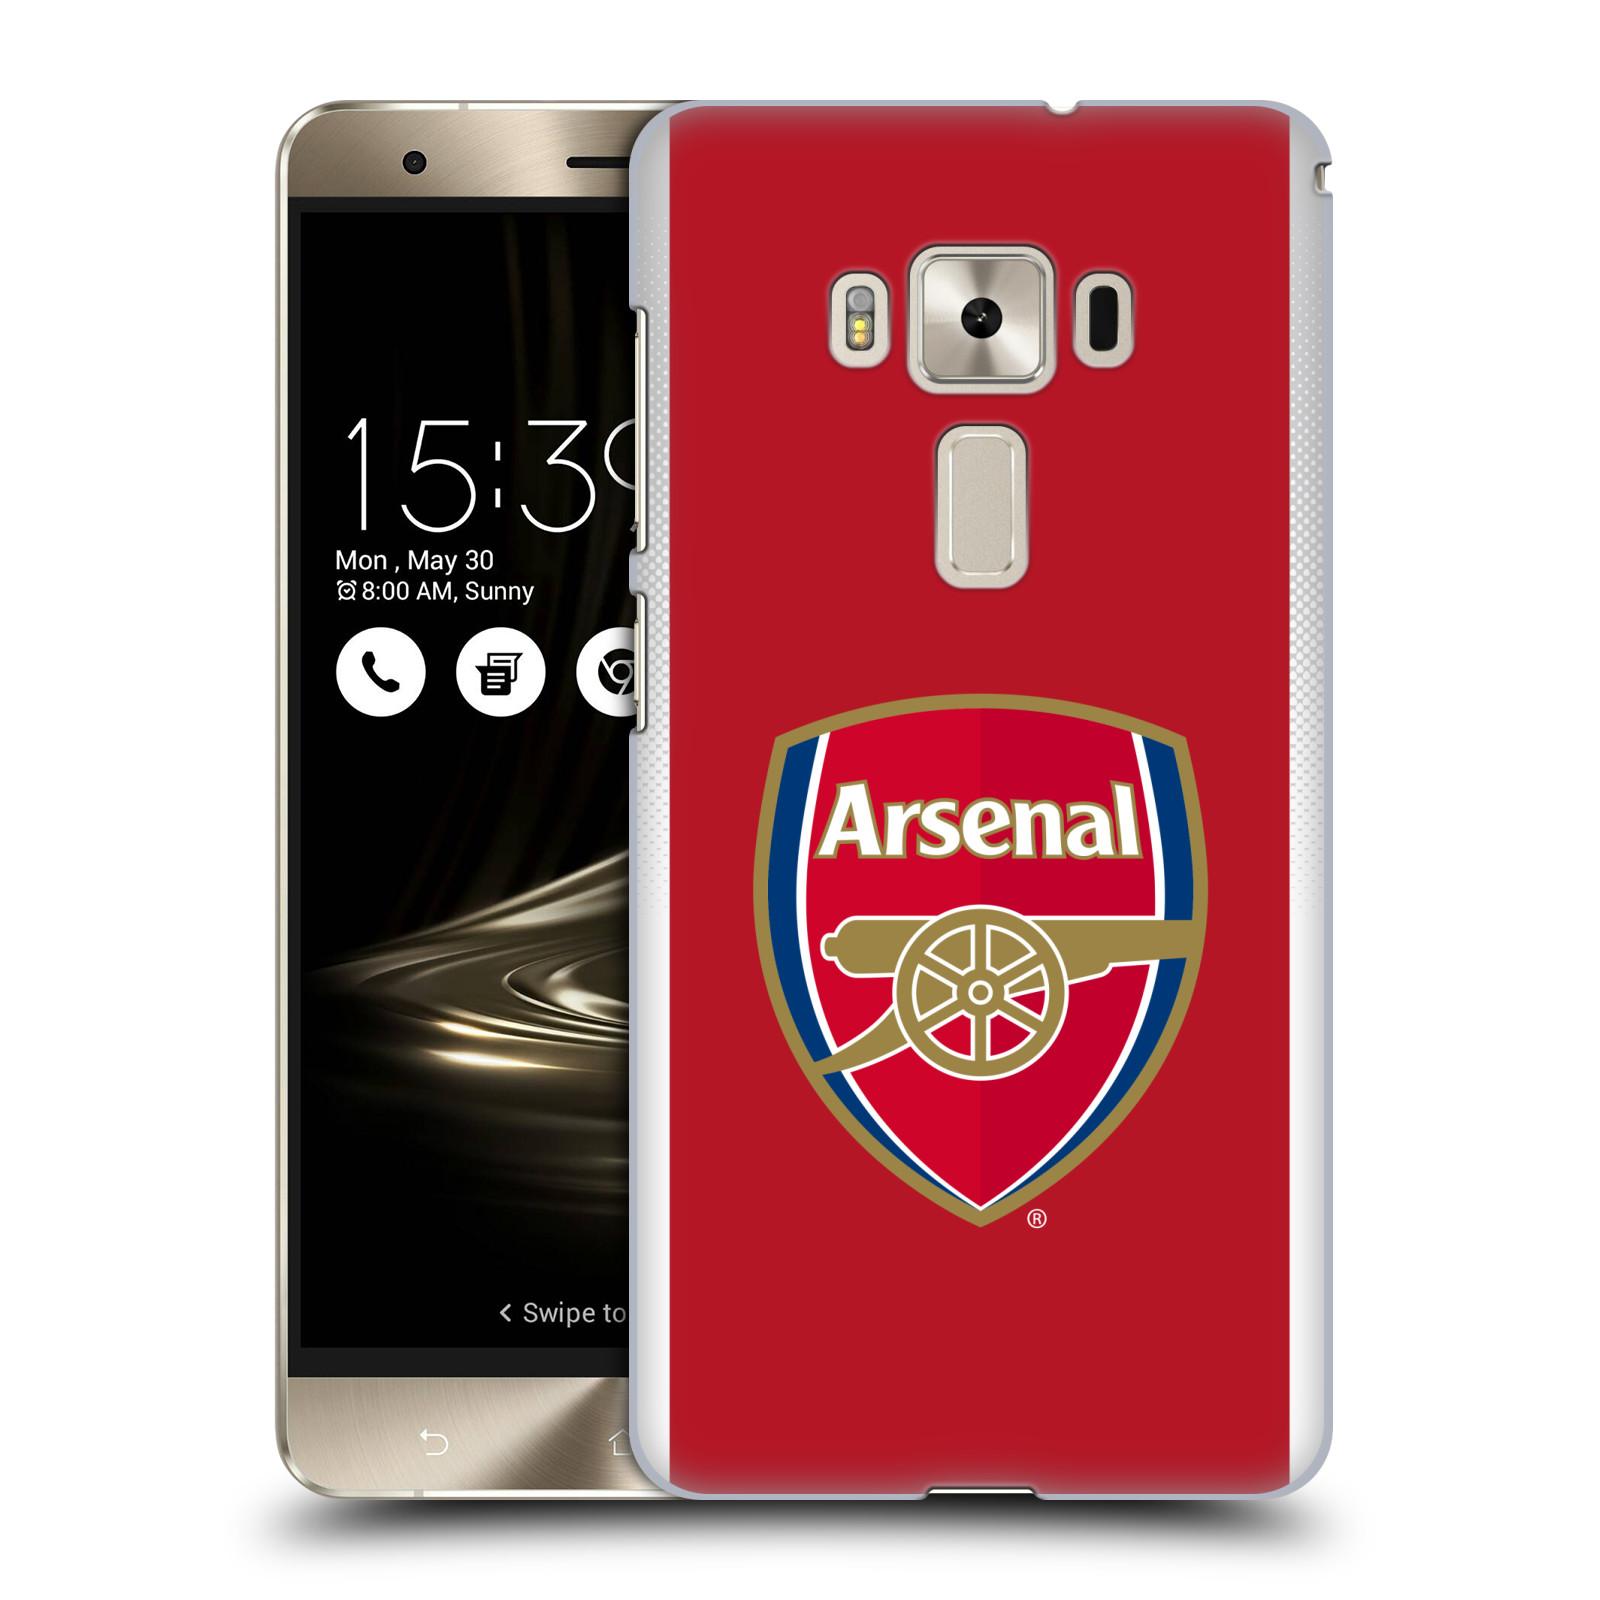 Plastové pouzdro na mobil Asus ZenFone 3 Deluxe ZS570KL - Head Case - Arsenal FC - Logo klubu